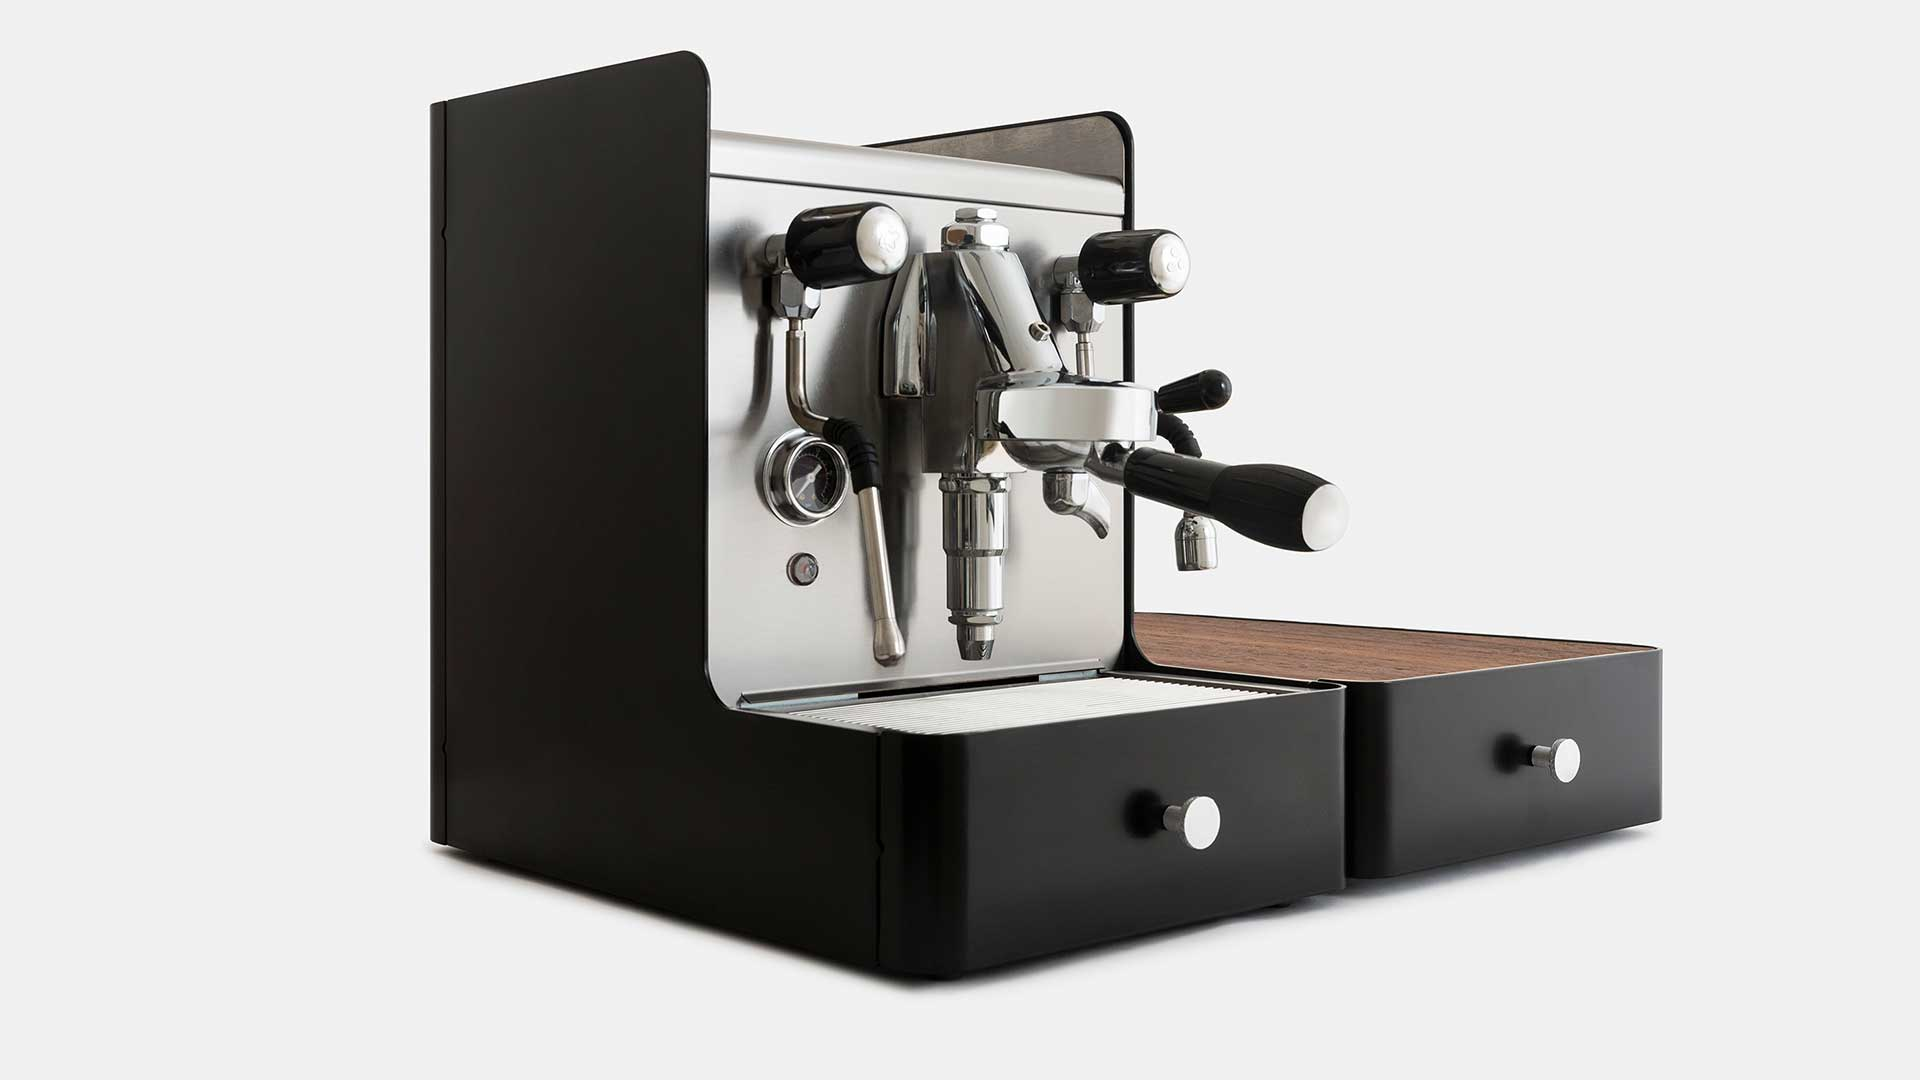 madame-la-scala-macchina-espresso-design-casa-caffe